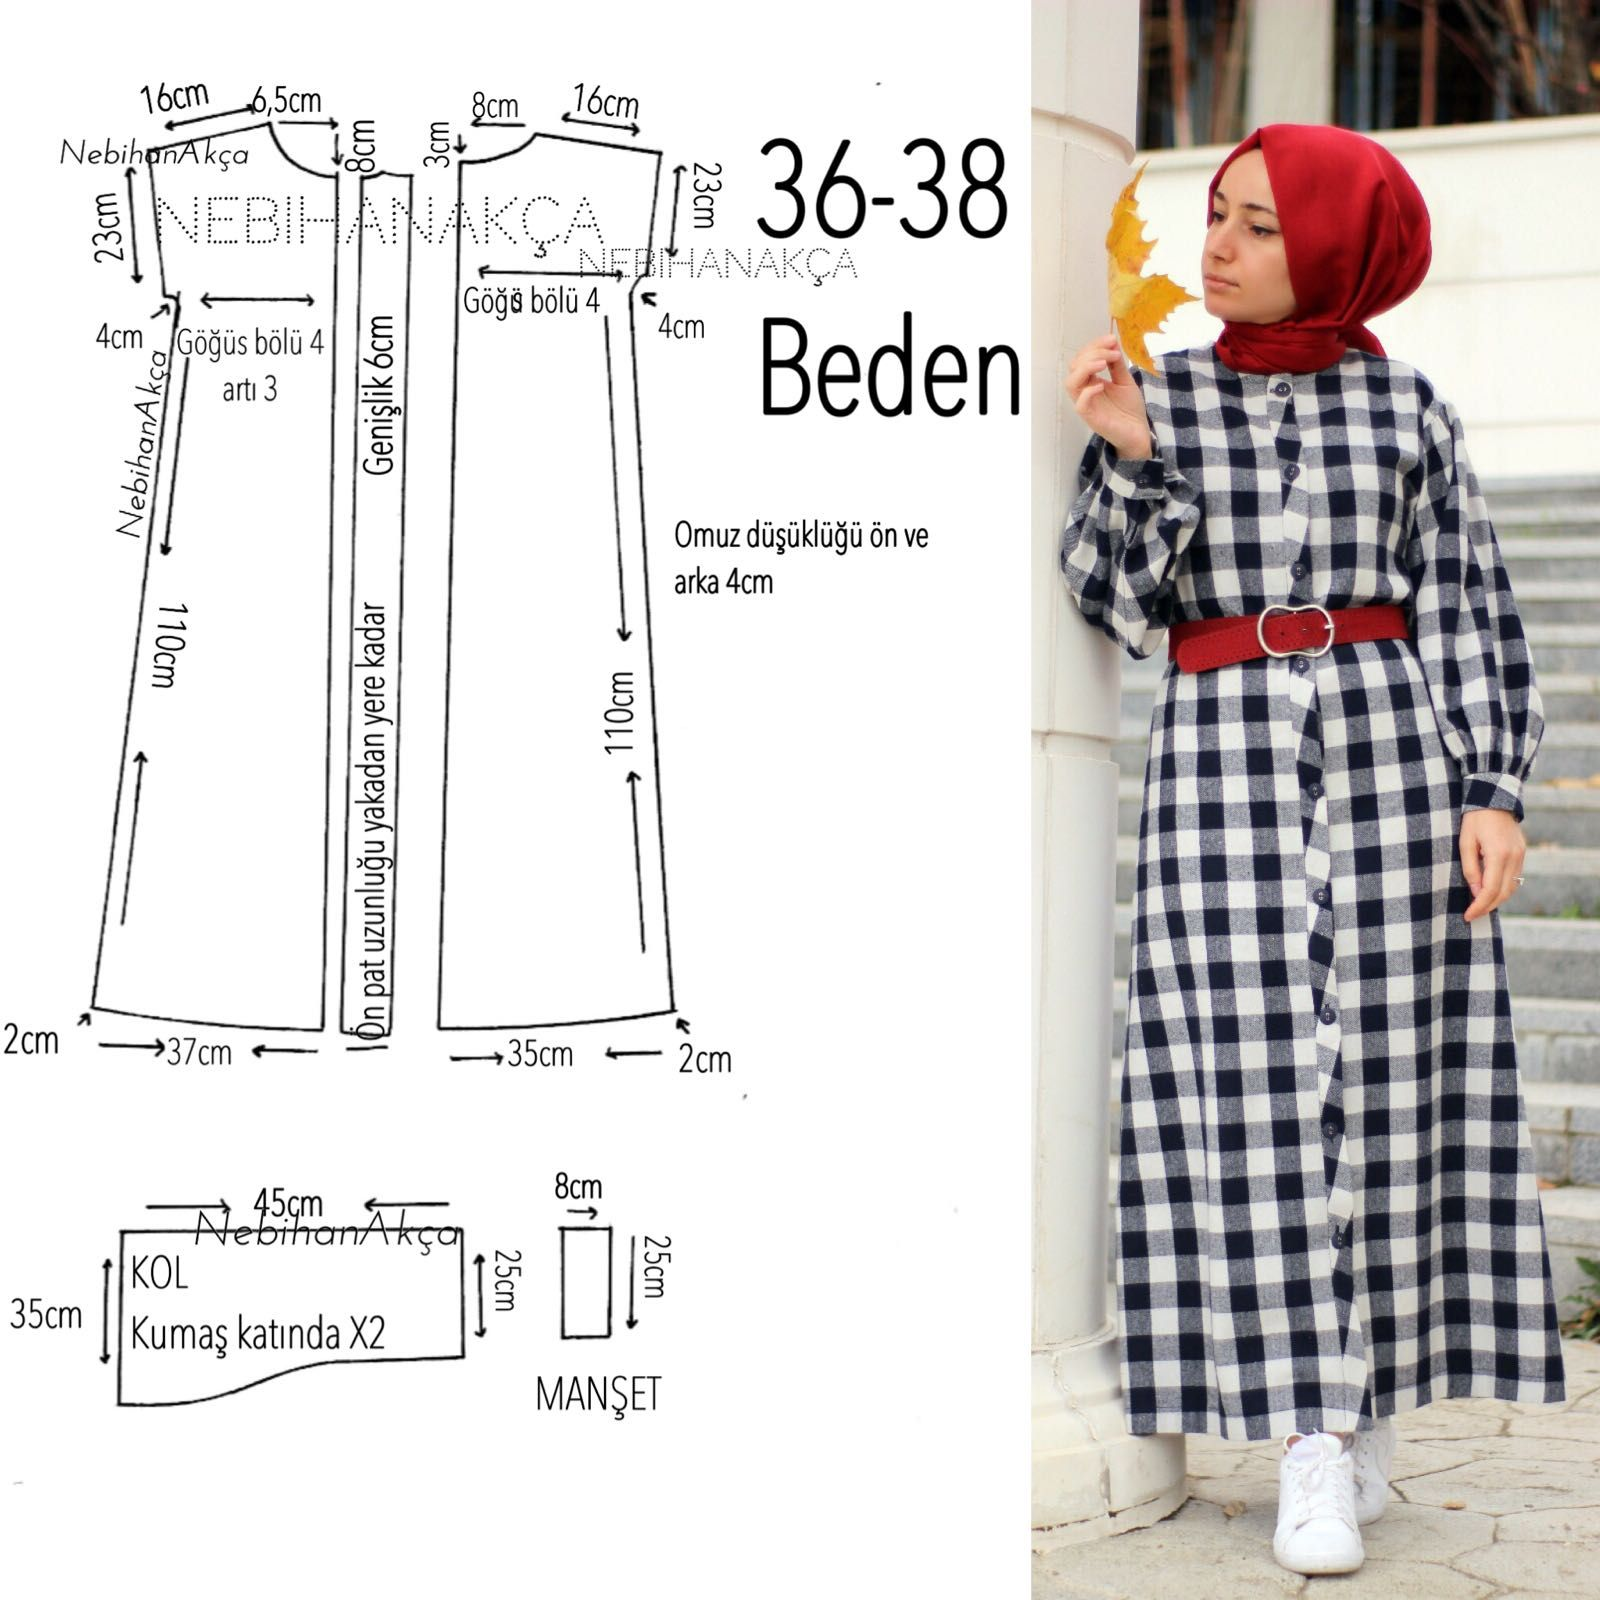 Moda Dikis Giyim Aksesuar Tasarim Tesettur Diy Kombin Hijab Fashion Anne Bebek Kitap Gunluk Kadin Site Ekose Moda Dikis Dikis